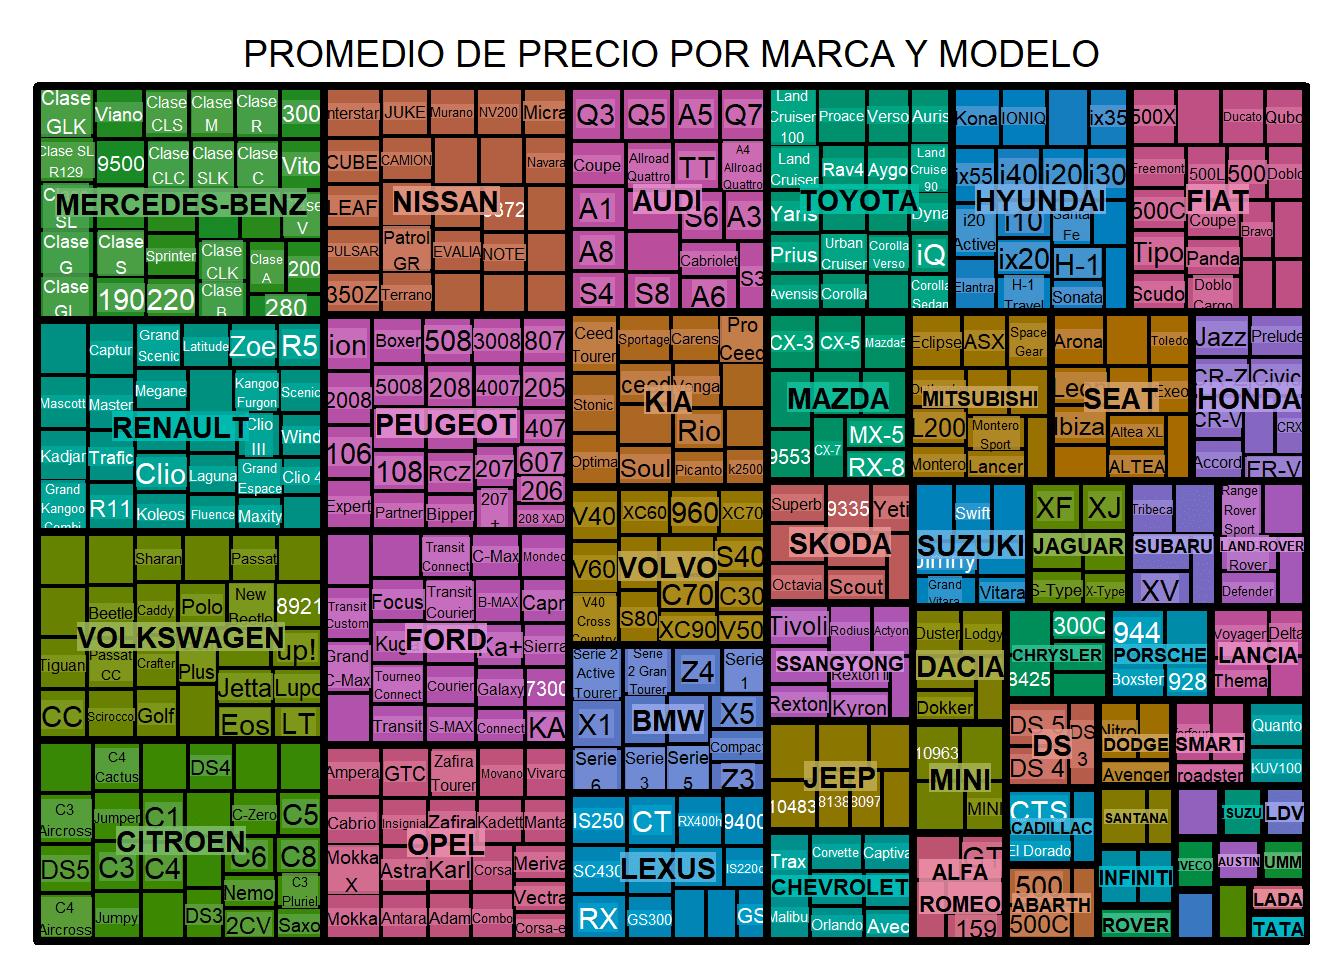 PromedioDePrecioPorMarcaYModelo